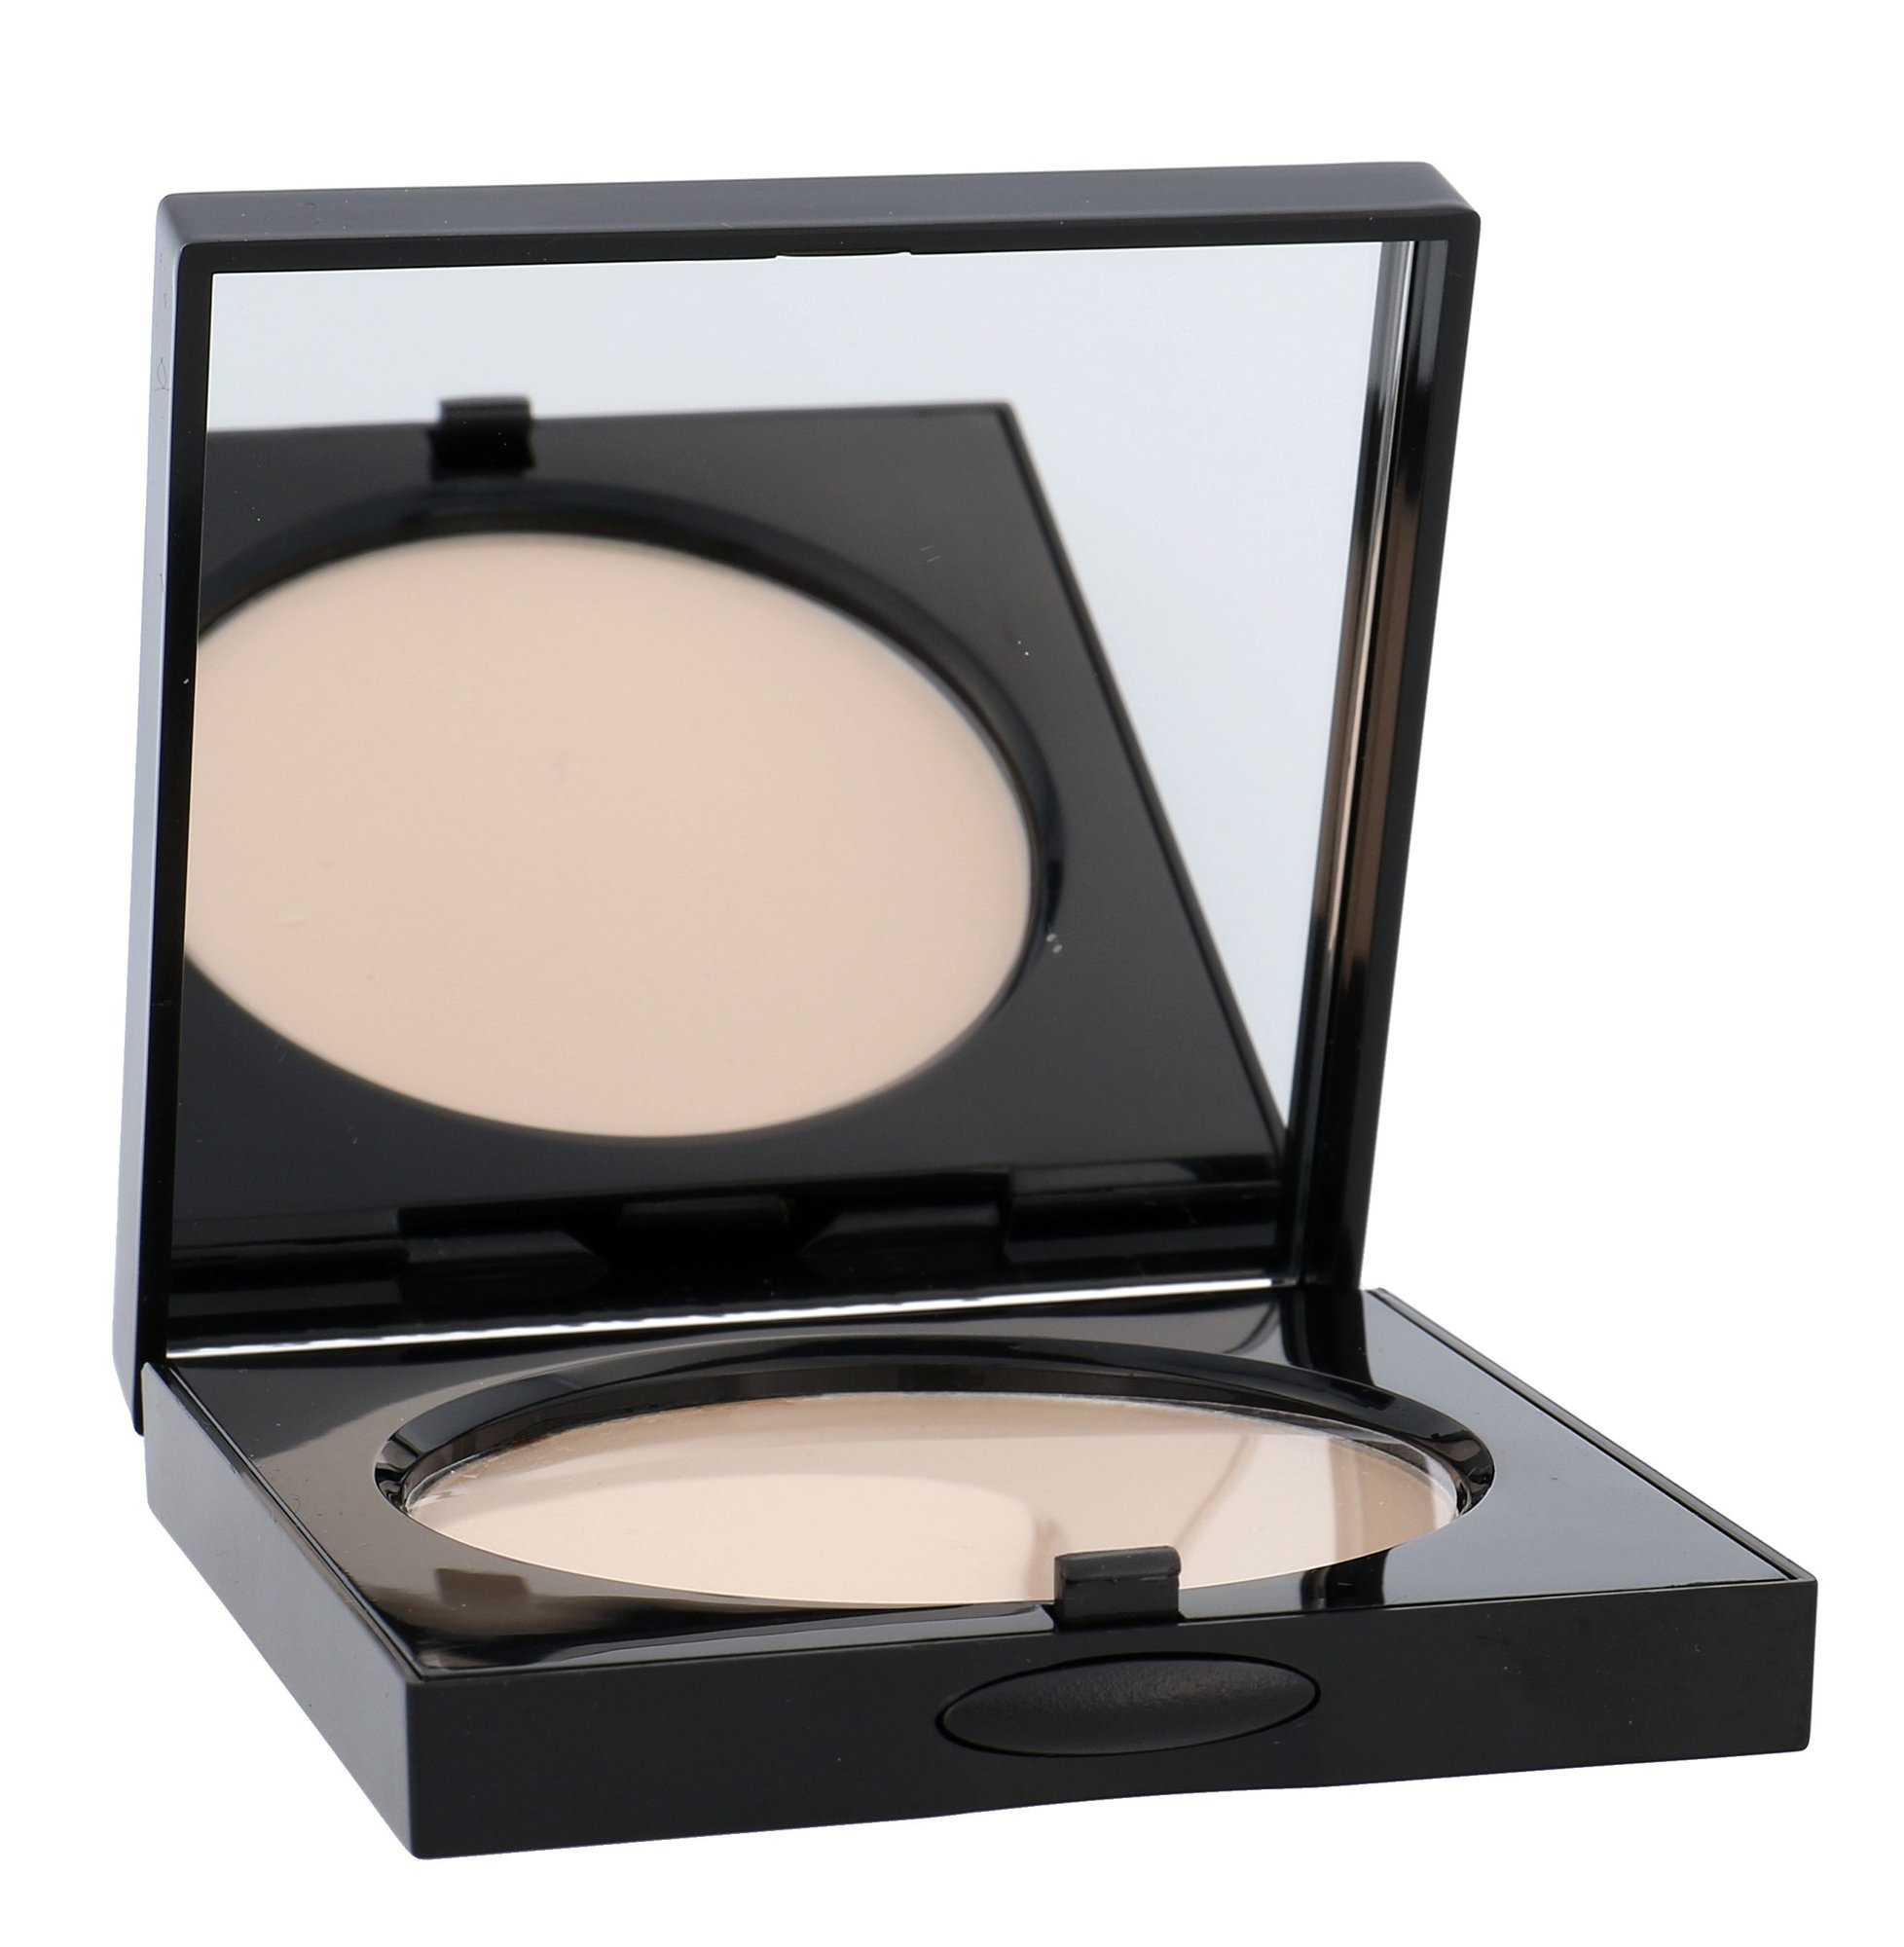 Bobbi Brown Sheer Finish Cosmetic 11ml 5 Soft Sand